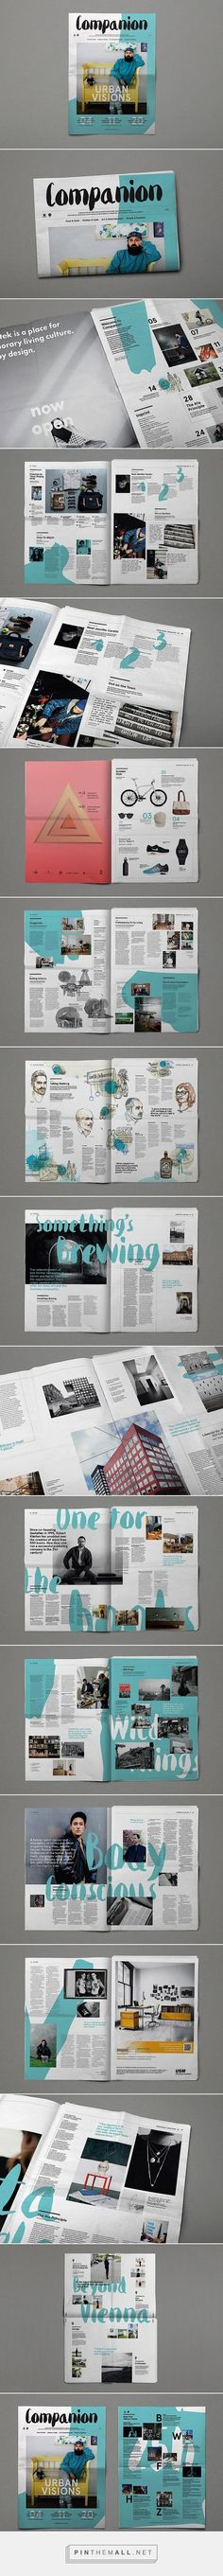 Editorial Design Inspiration: Companion Magazine   Abduzeedo Design Inspiration: